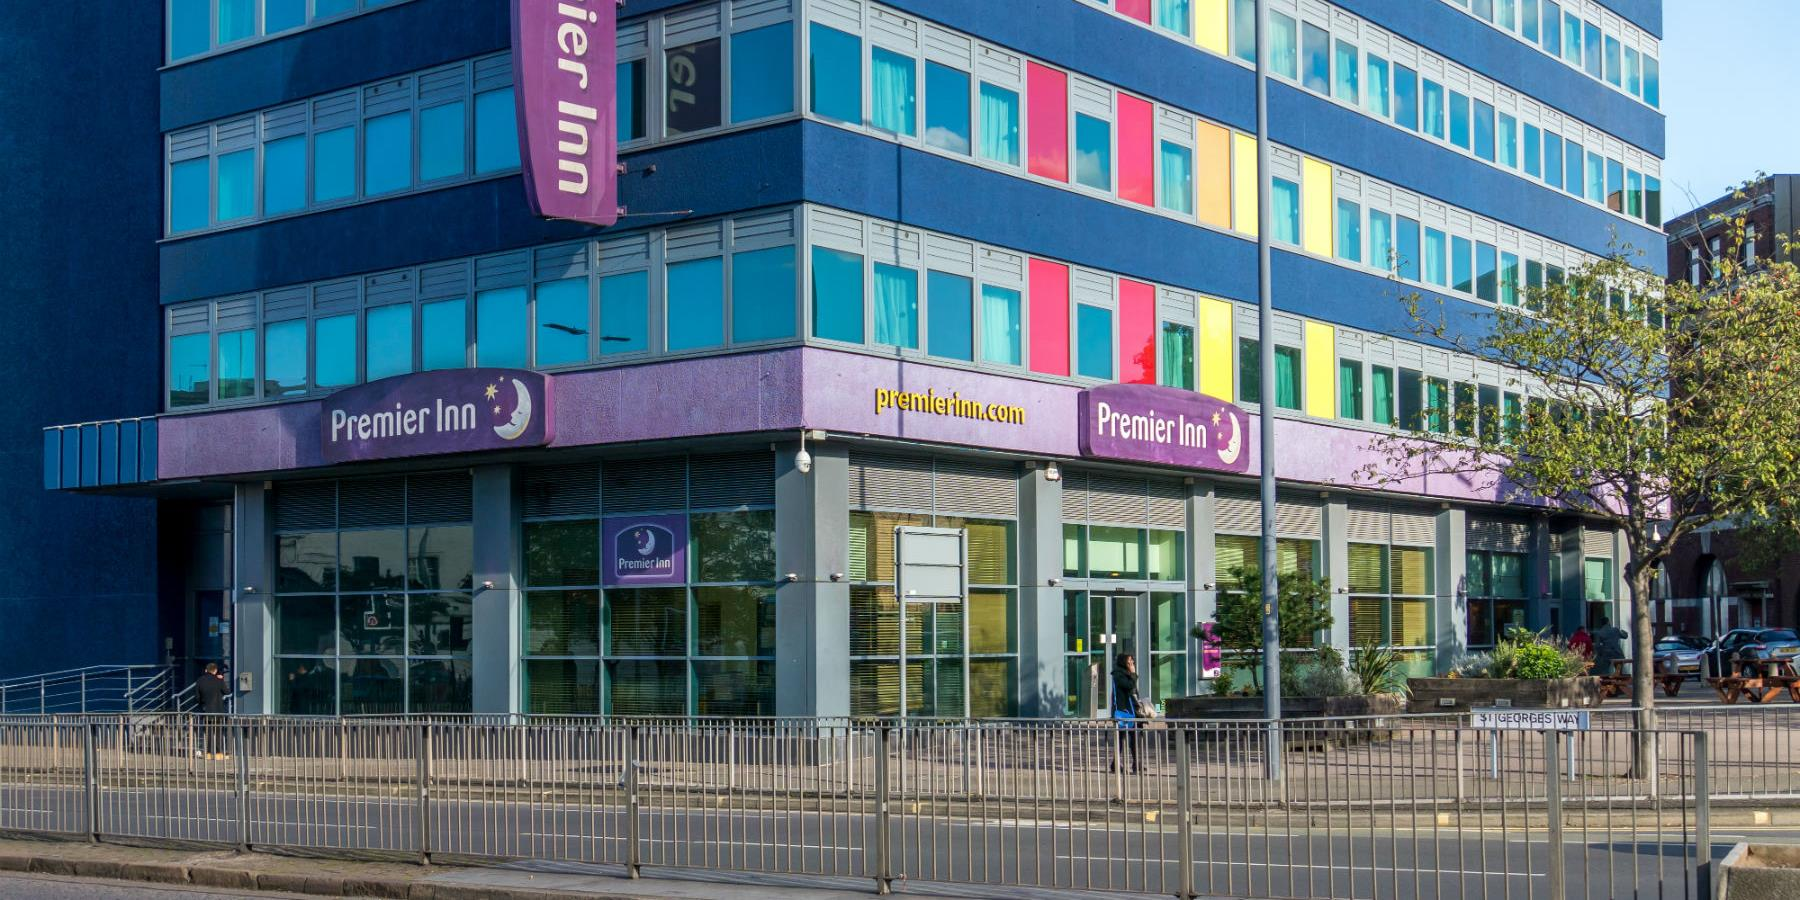 Premier Inn - Accommodation in Leicester